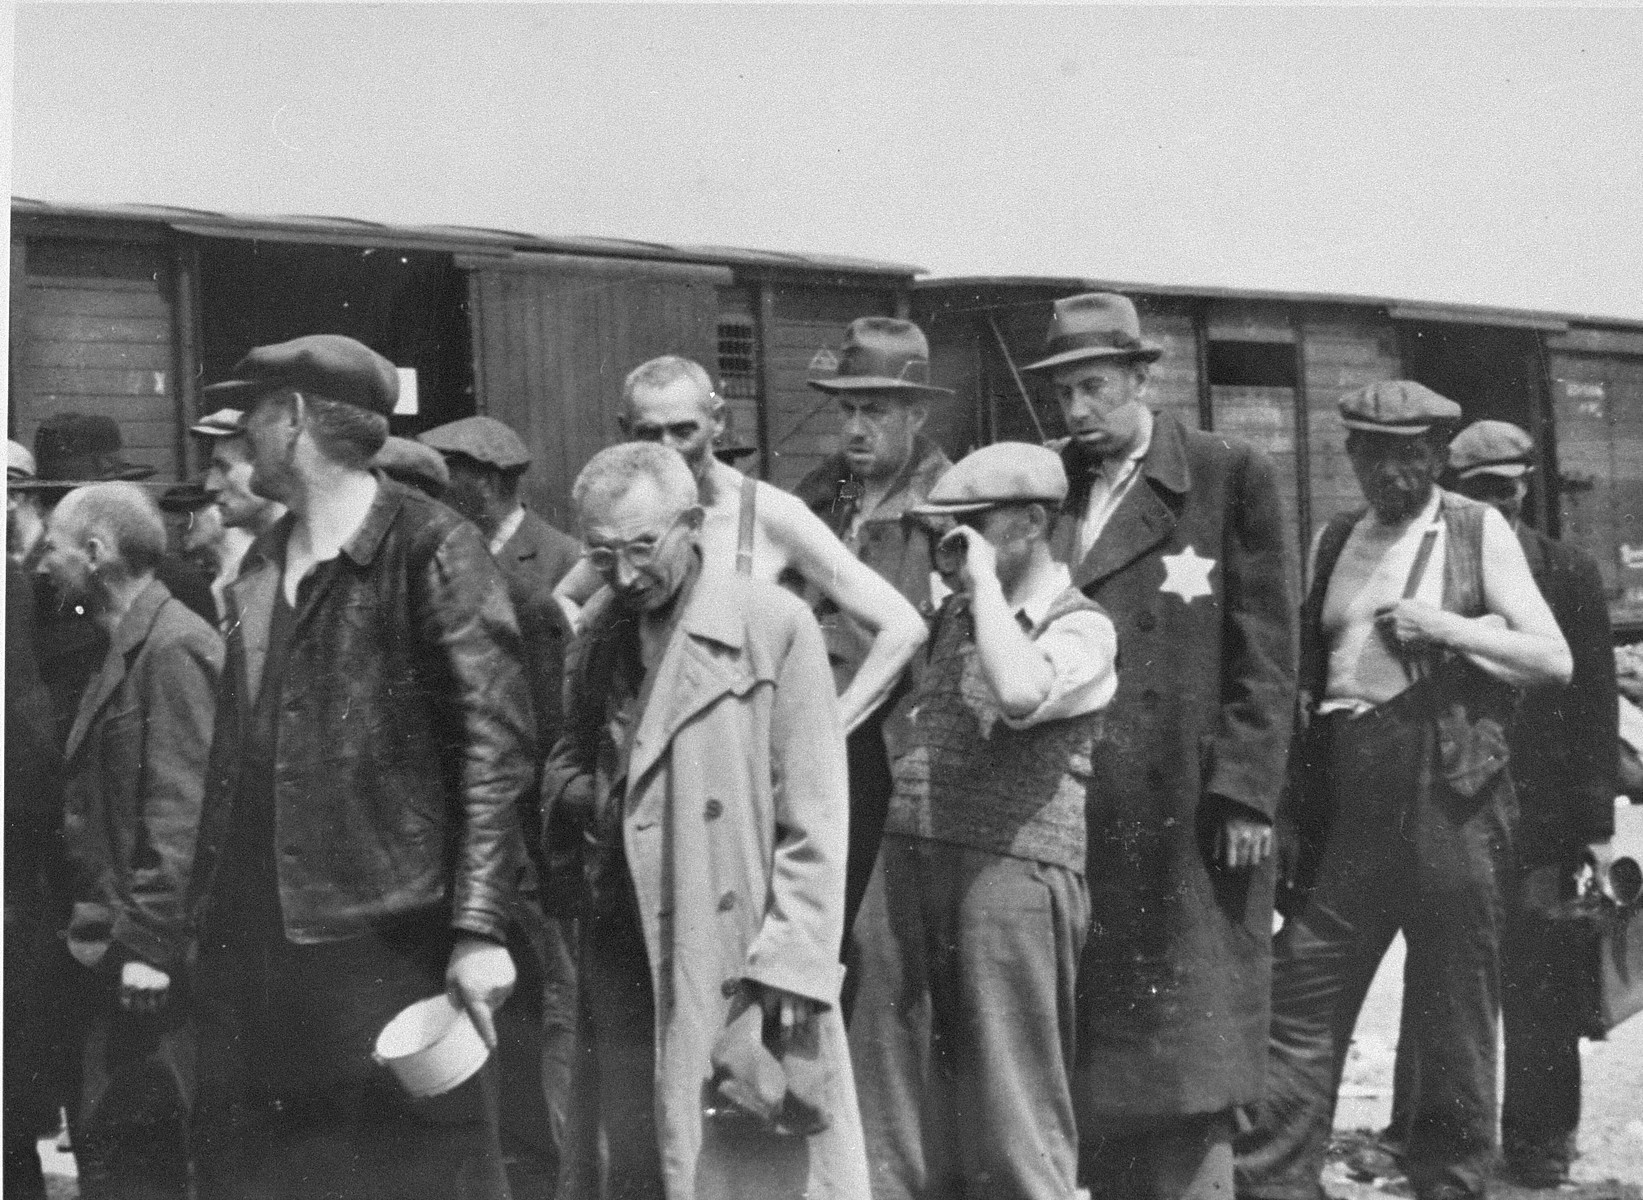 Jewish men from Subcarpathian Rus await selection on the ramp at Auschwitz-Birkenau.